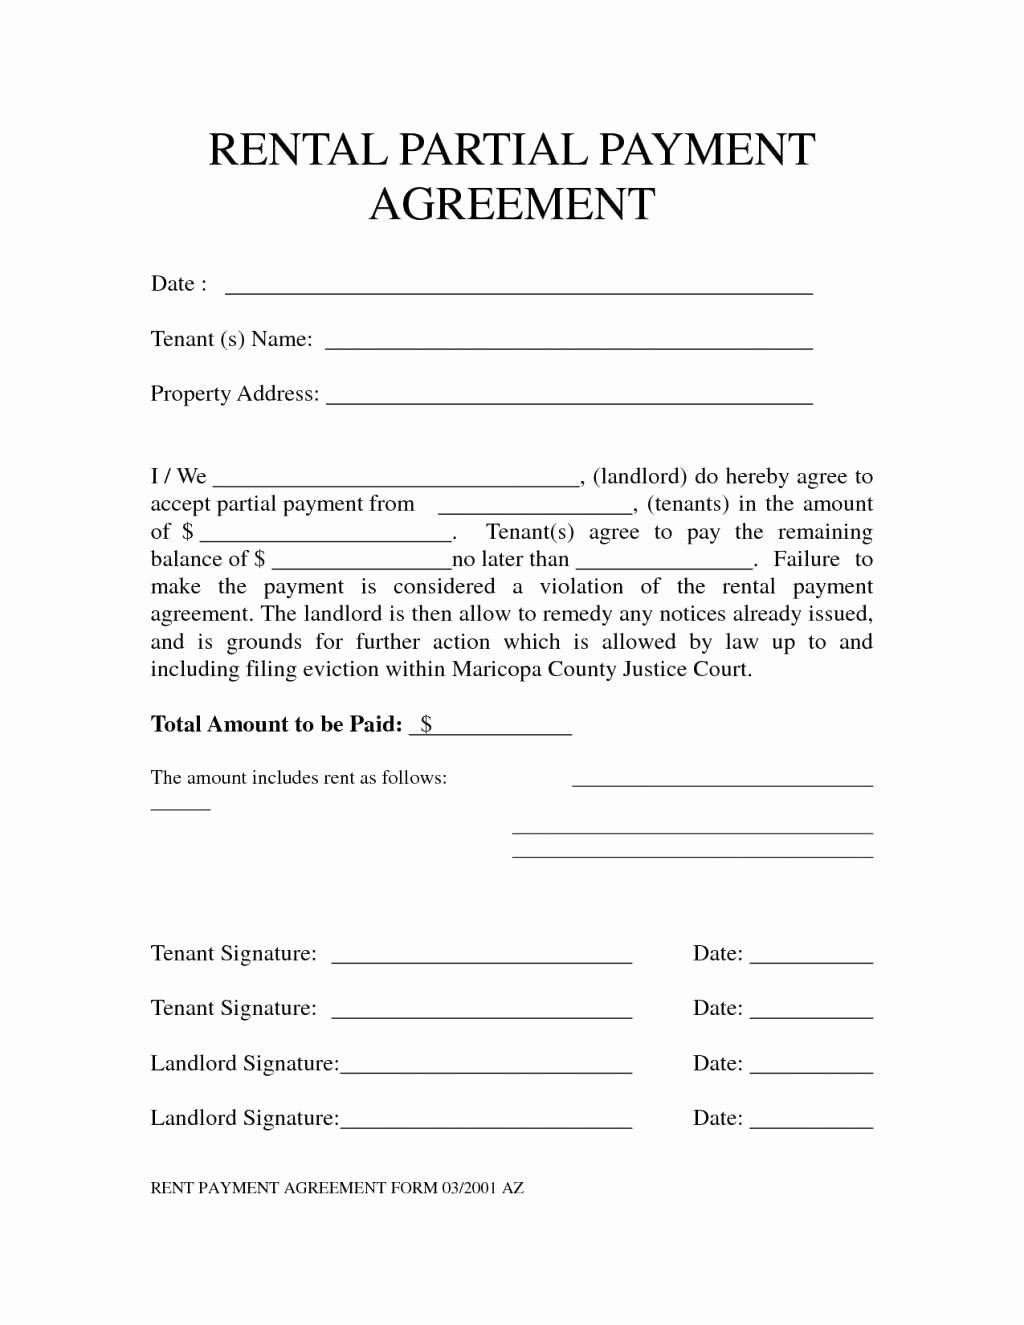 Salary Agreement Letter Inspirational Agreement to Pay Rent Advanced Rent Agreement Letter